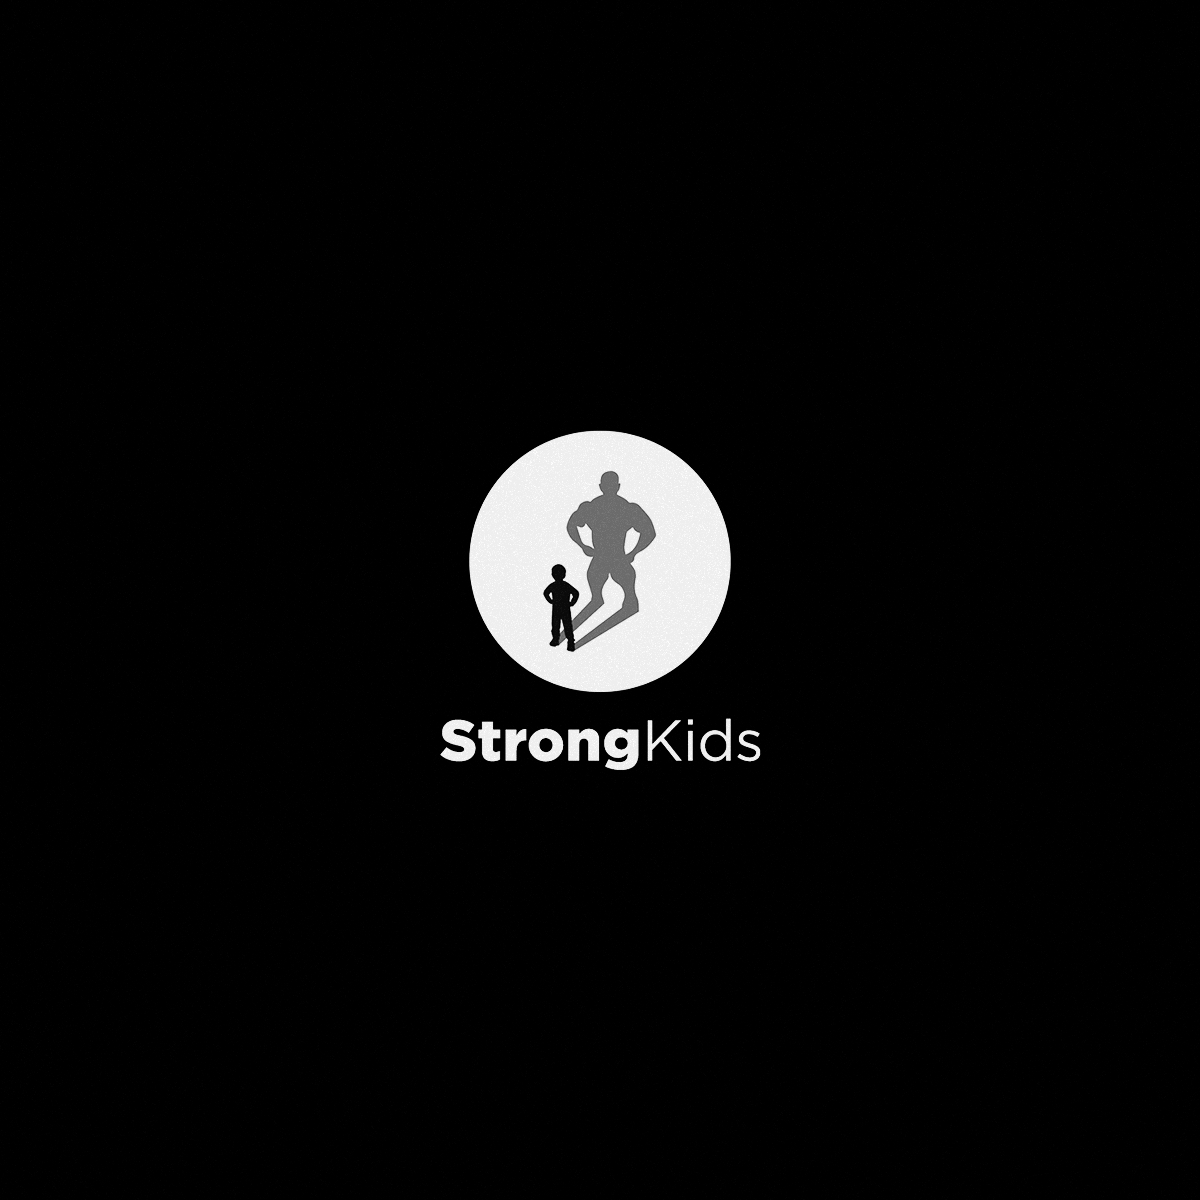 Логотип для Детского Интернет Магазина StrongKids фото f_0335c6ea19a1c23f.png